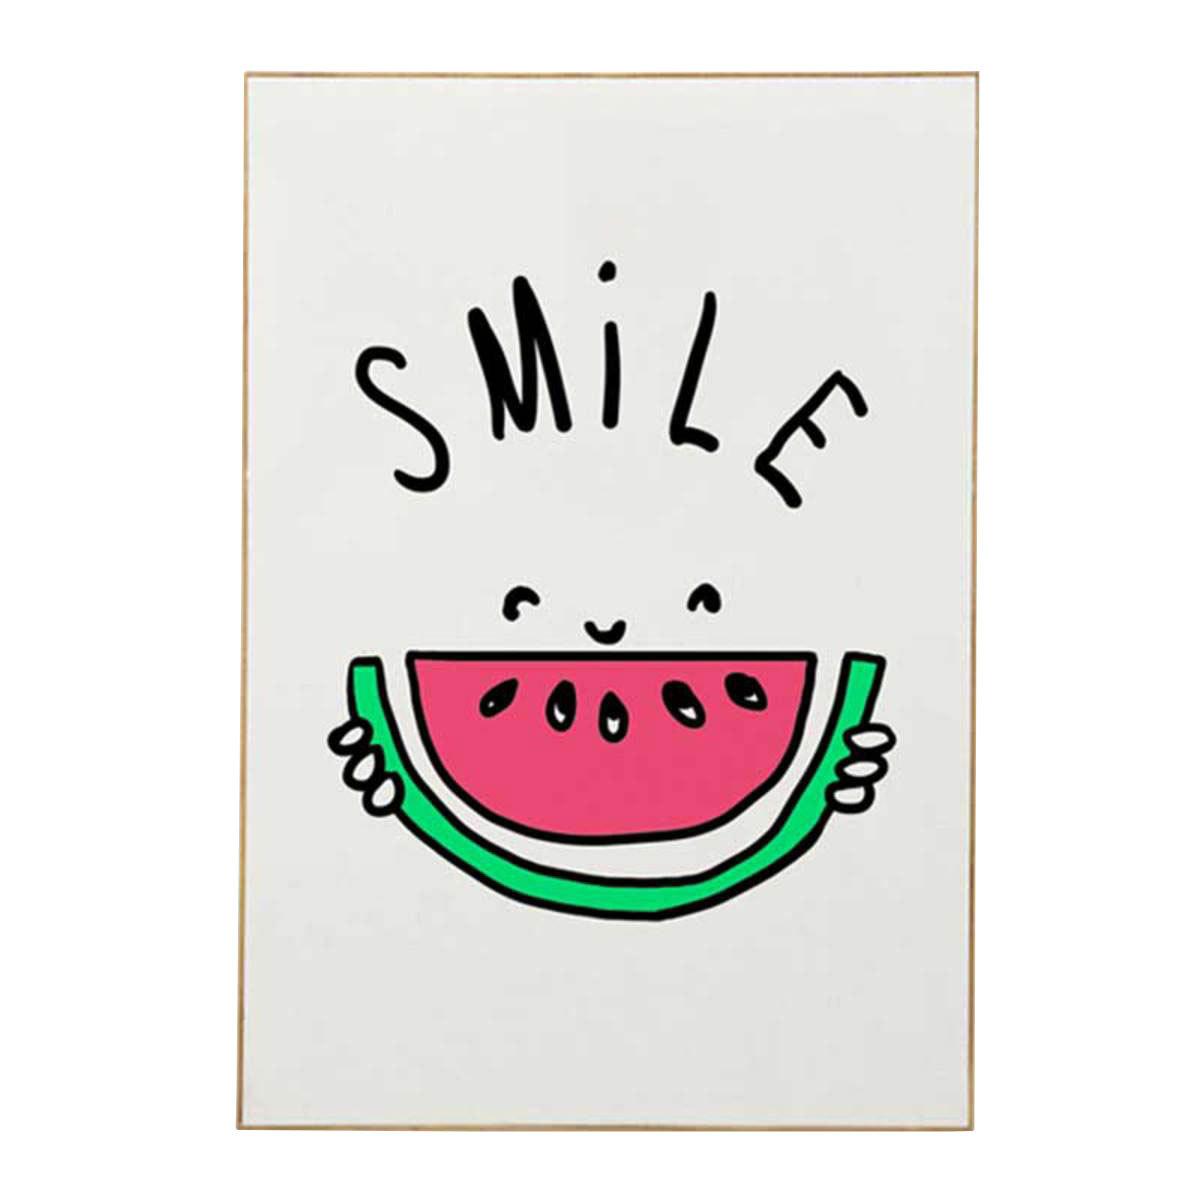 Affiche & poster Affiche Smile Affiche Smile